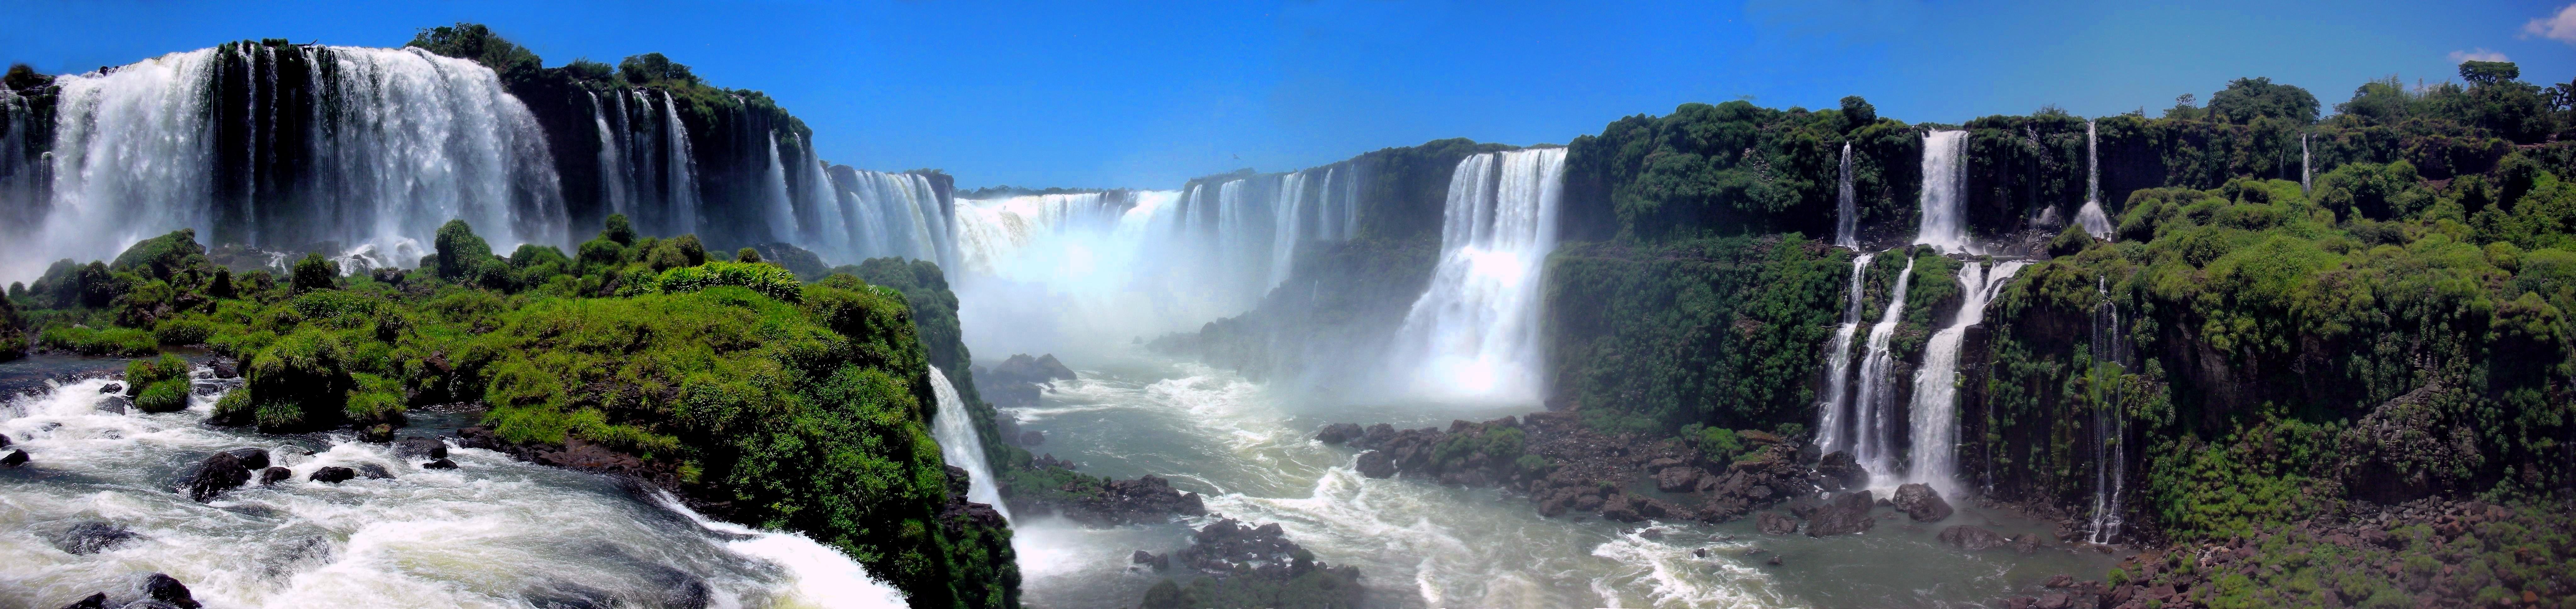 Niagara Falls Wallpaper Photography Musings On The Improbable Oddities Of Life